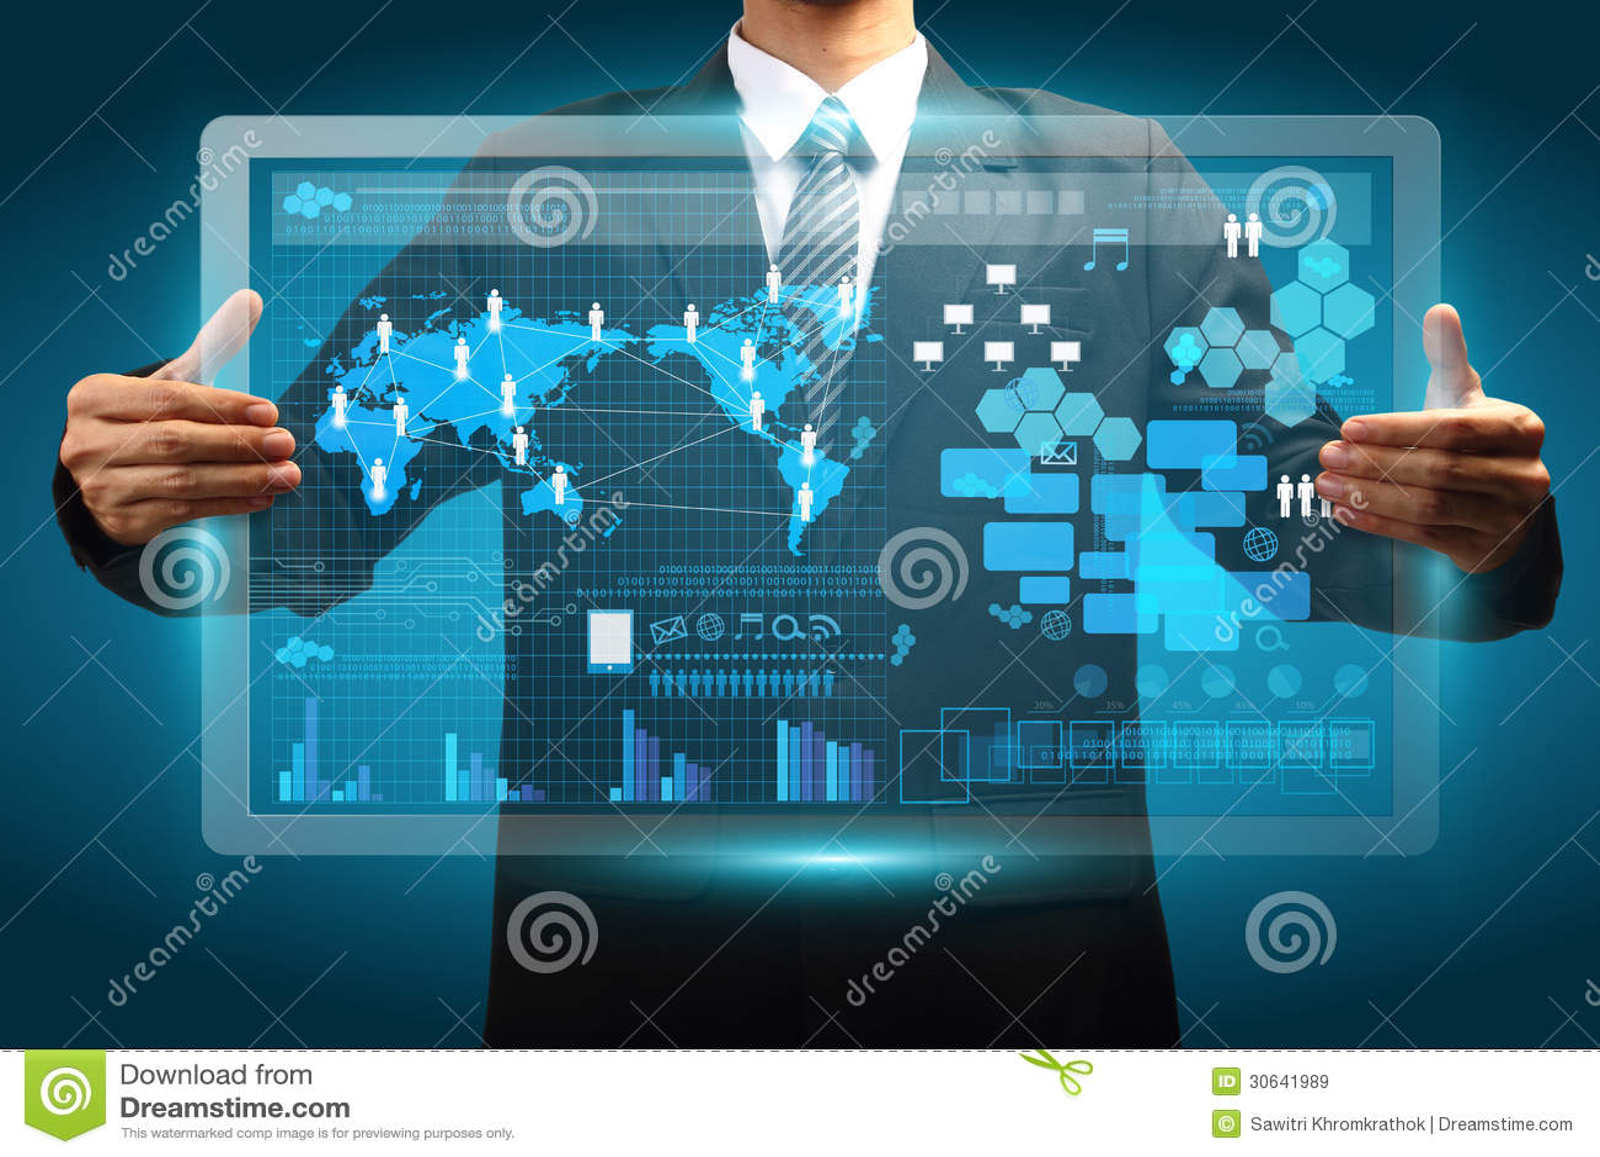 Technology Management Image: Hand Holding Digital Vurtual Screen Technology Business